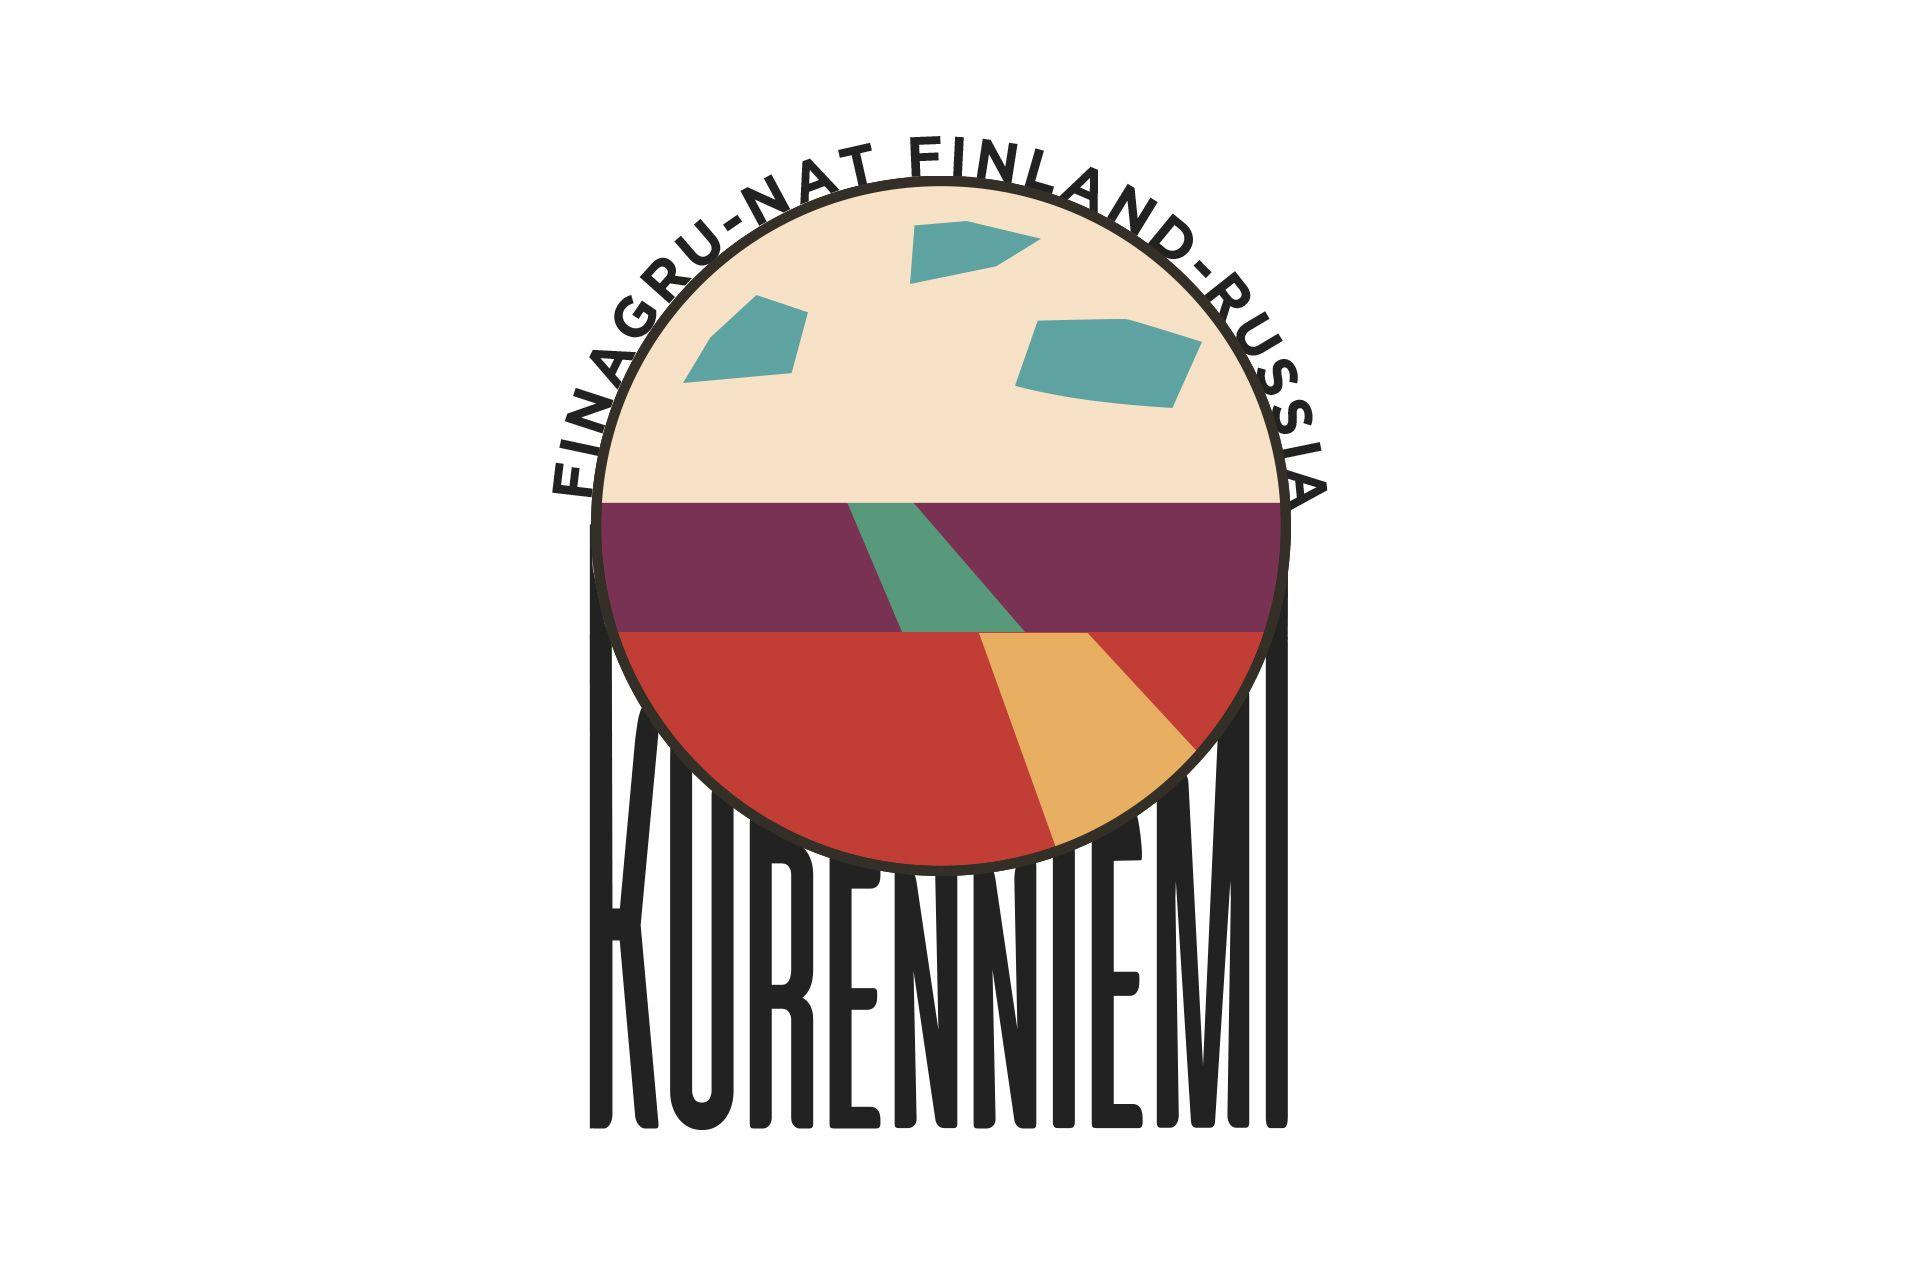 Логотип для Kurenniemi, FinAgRu-nat, Finland-Russia - дизайнер tofindmaria